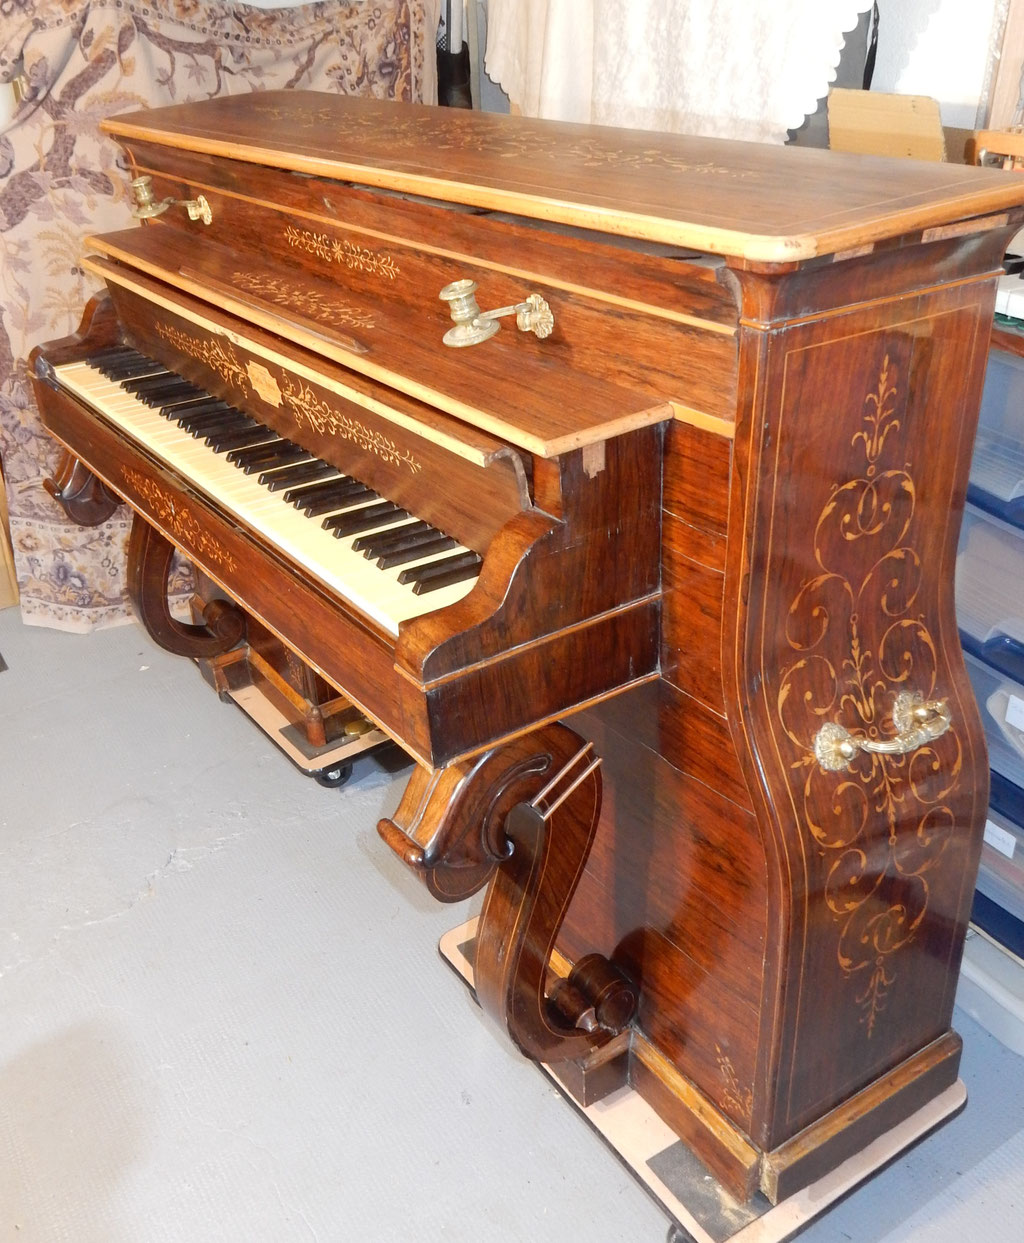 Martin frère 1825 piano pont ou niche à chien